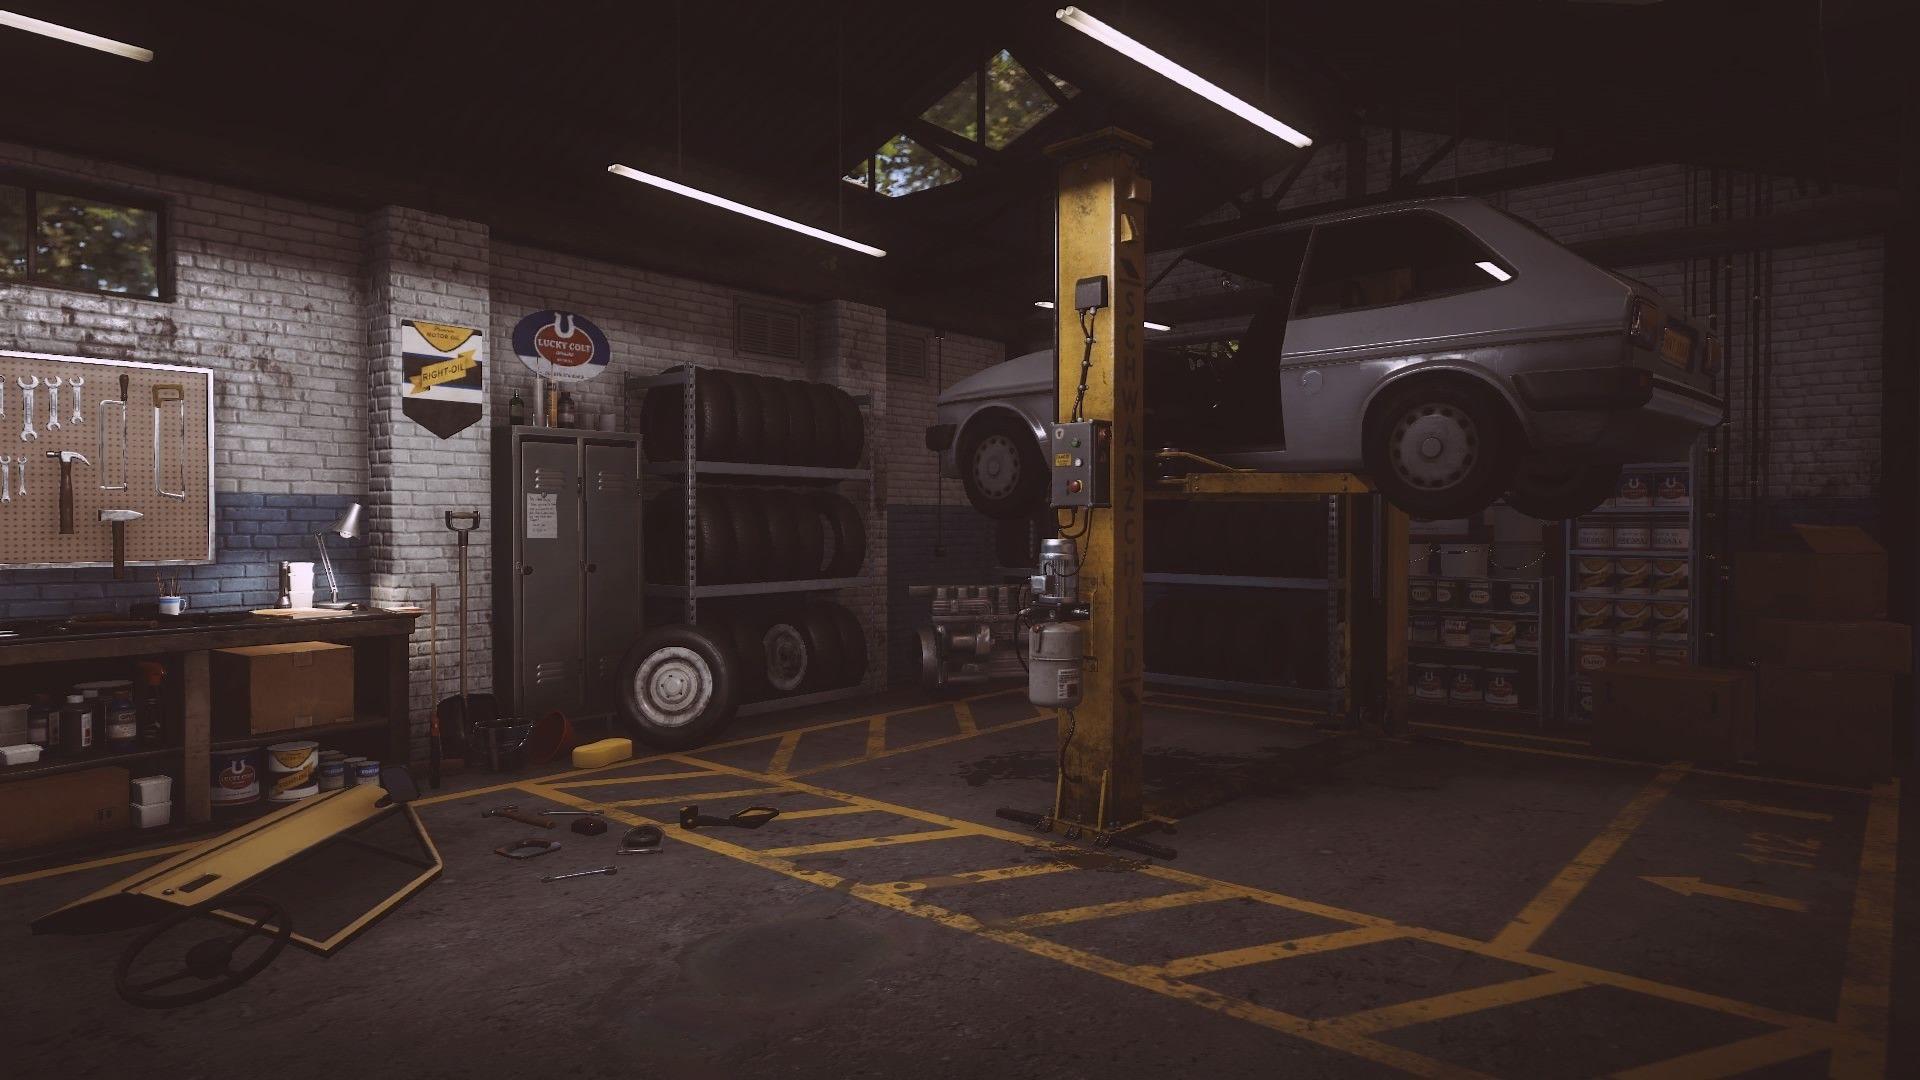 Garage wallpaper photo